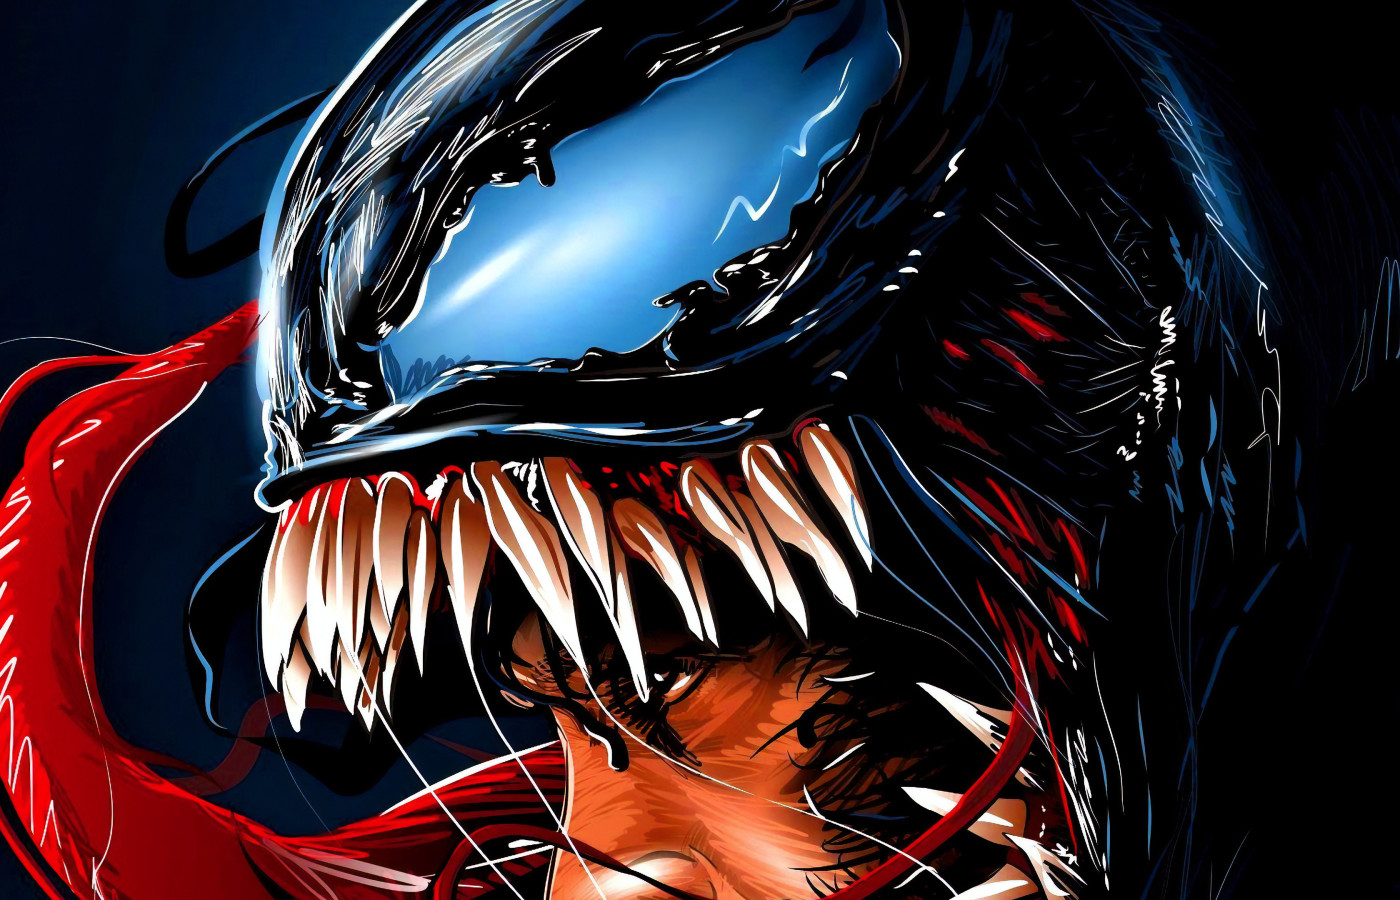 Venom Wallpaper 4k 2928498 Hd Wallpaper Backgrounds Download